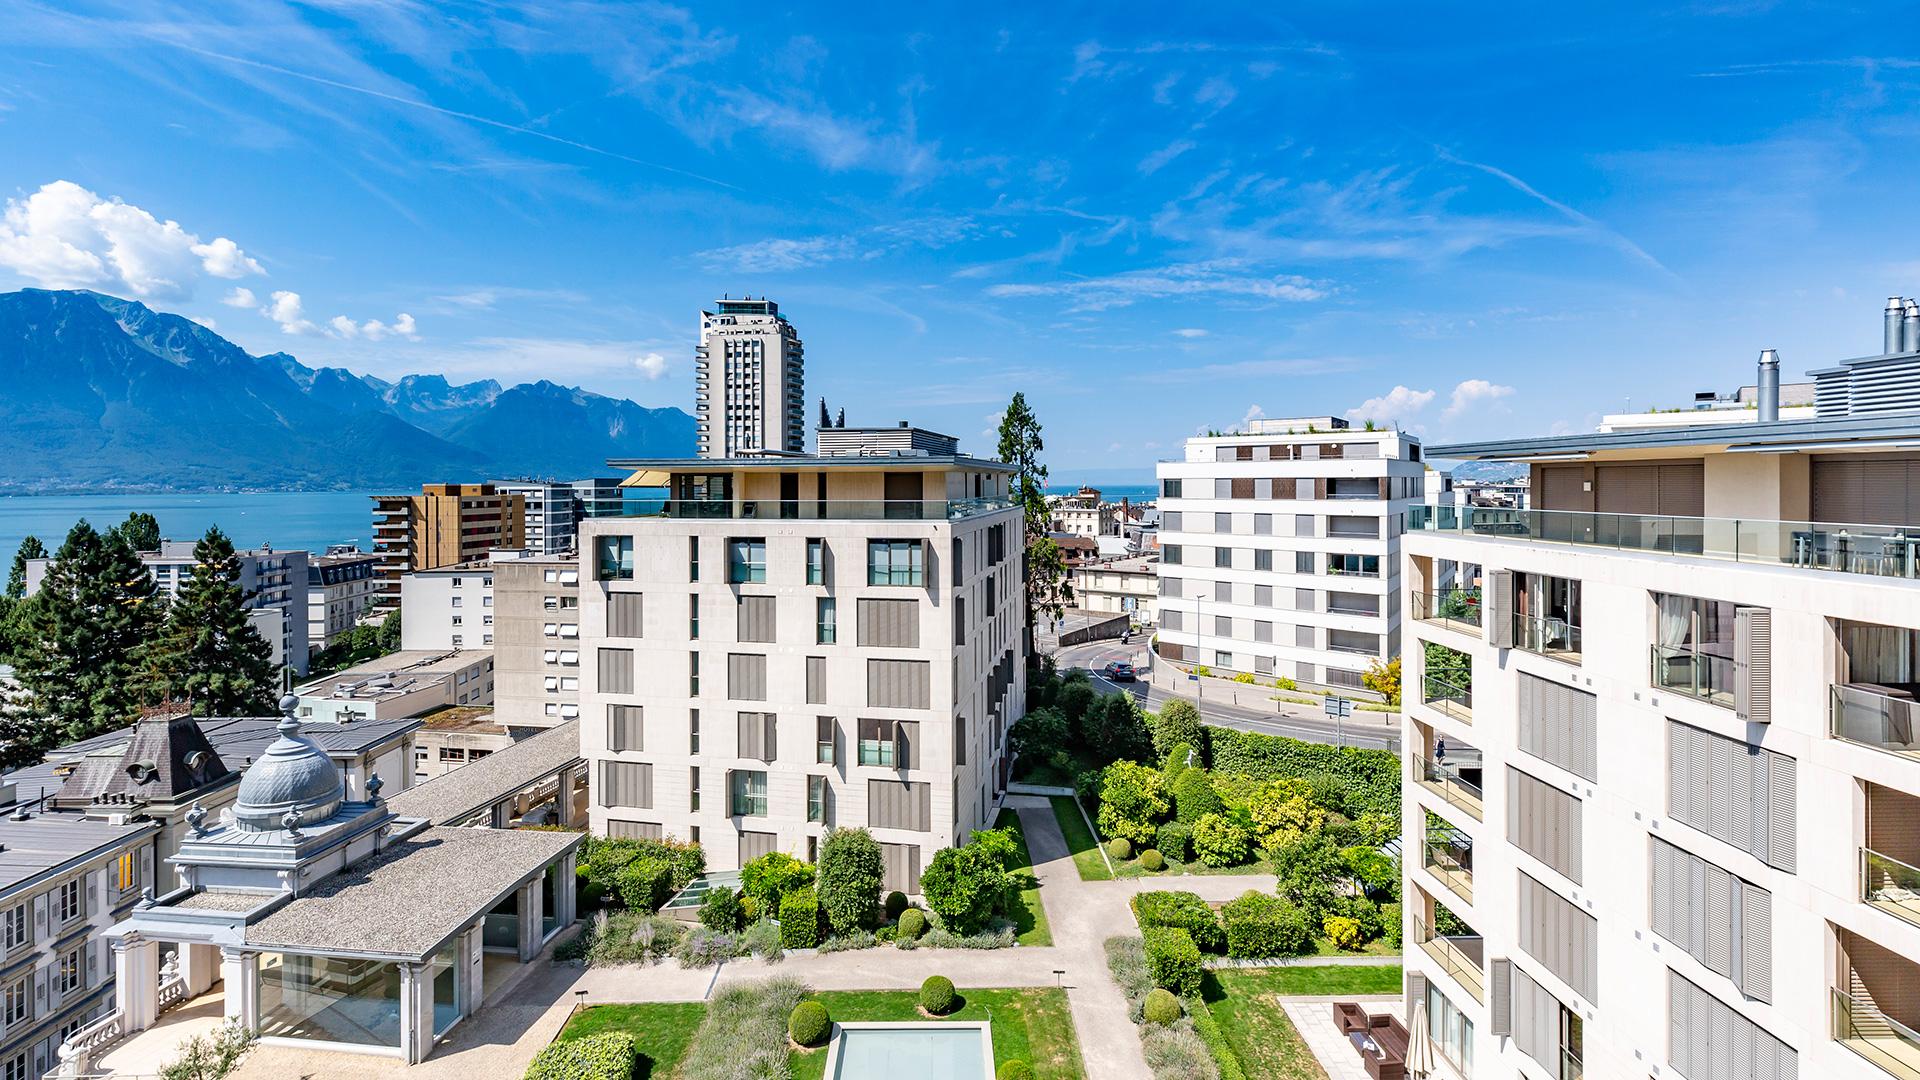 Le National 6 Apartments, Switzerland